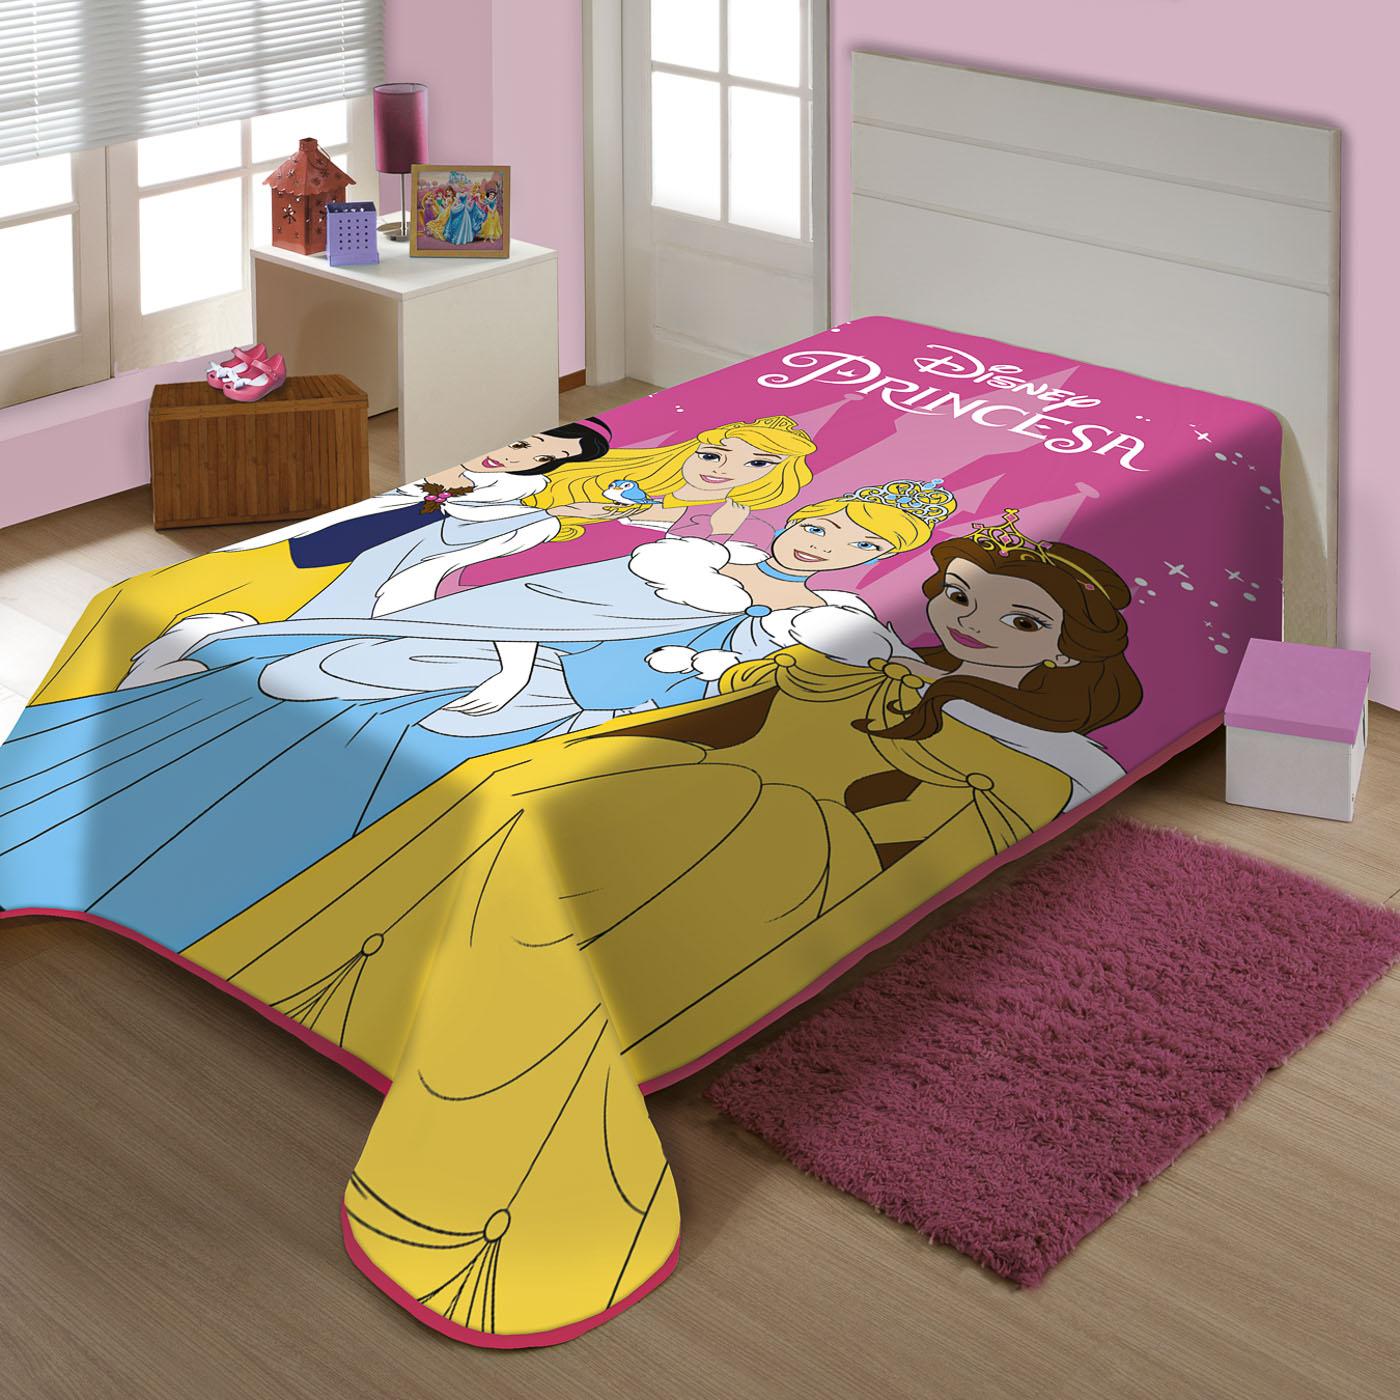 Cobertor Juvenil Raschel Charme De Princesas Jolitex Ternille